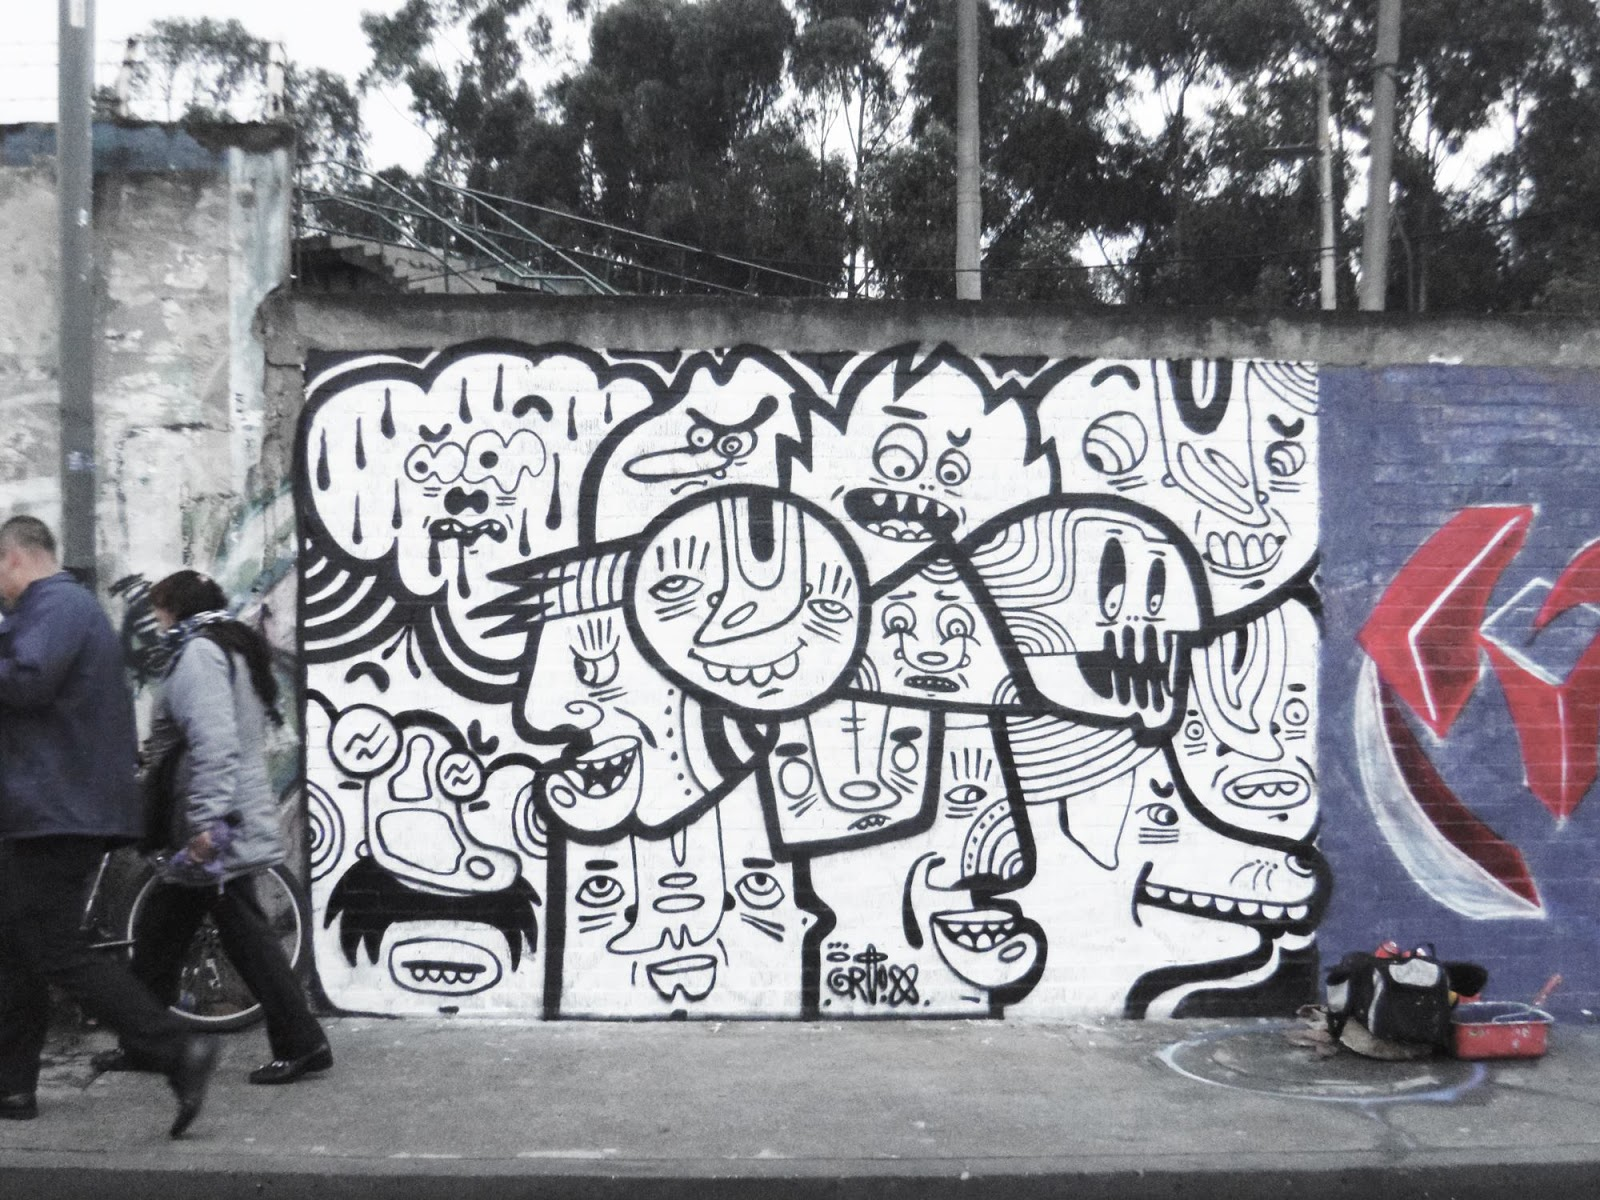 Arte urbano, El comienzo del cartoon network de Giovanny Ortiz Jimenez aka Ortix